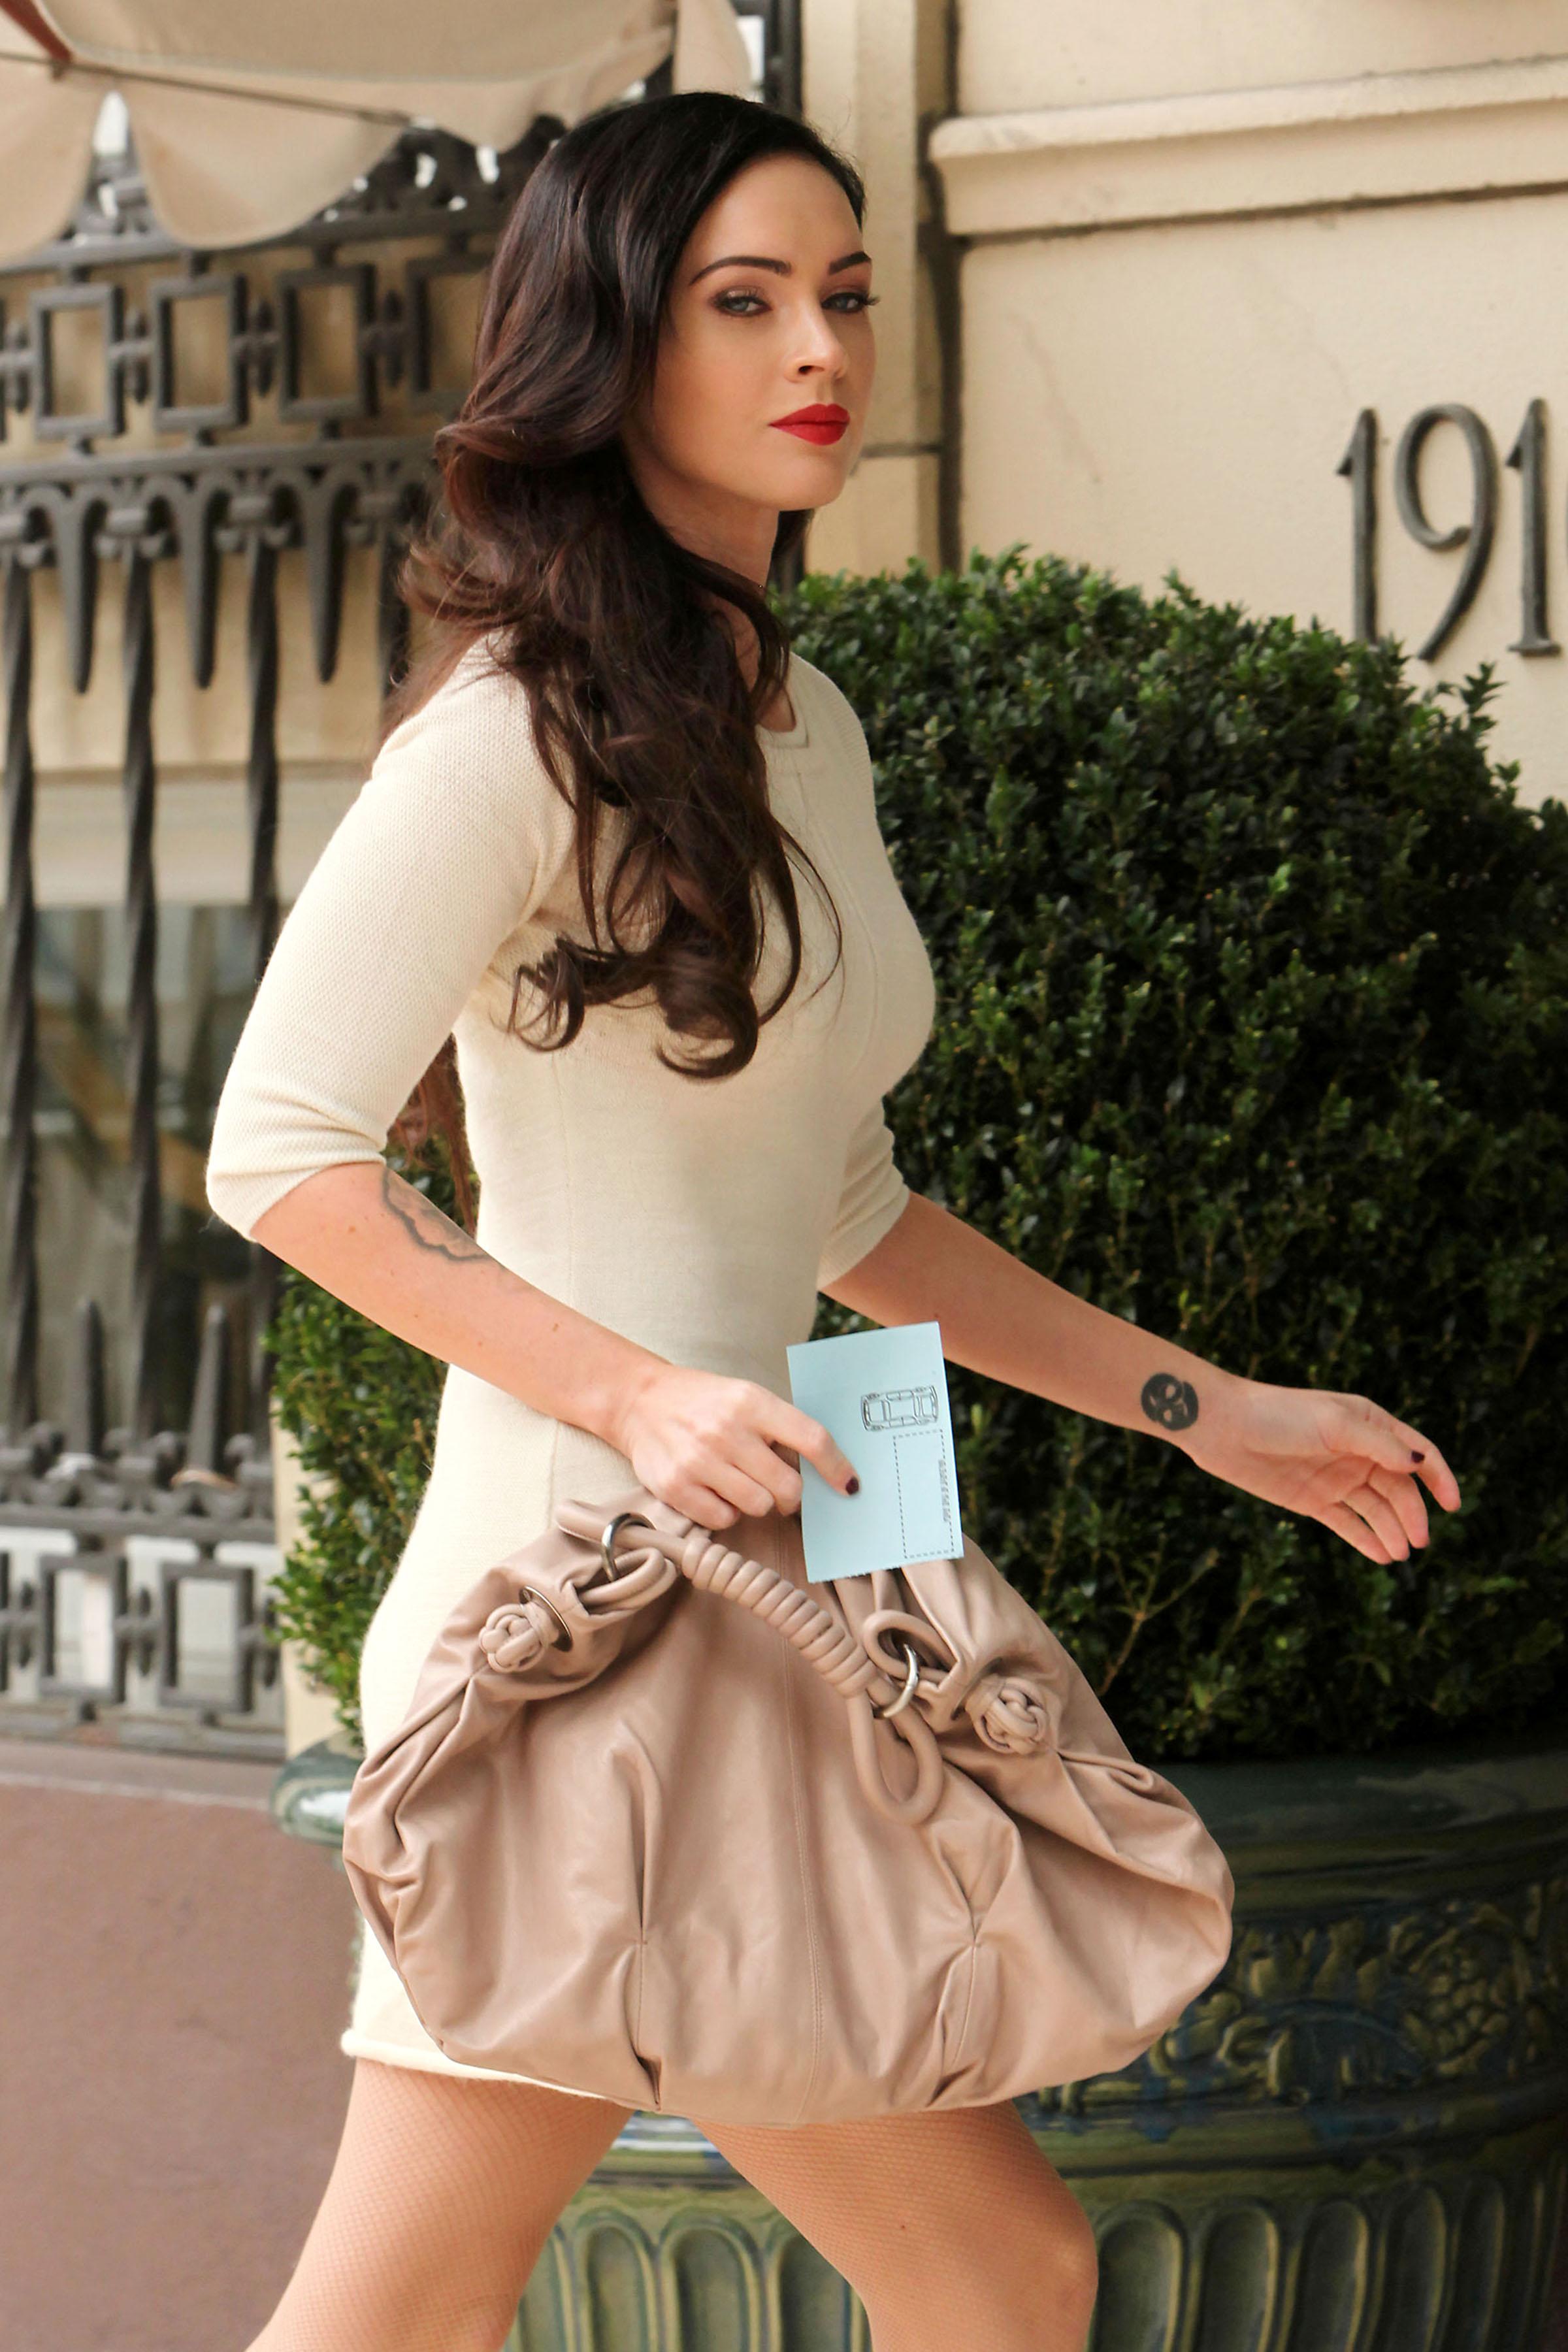 82993_Megan_Fox_at_Hotel_Casa_del_Mar_in_Santa_Monica_-_August_130_2009_-_01_122_1163lo.jpg